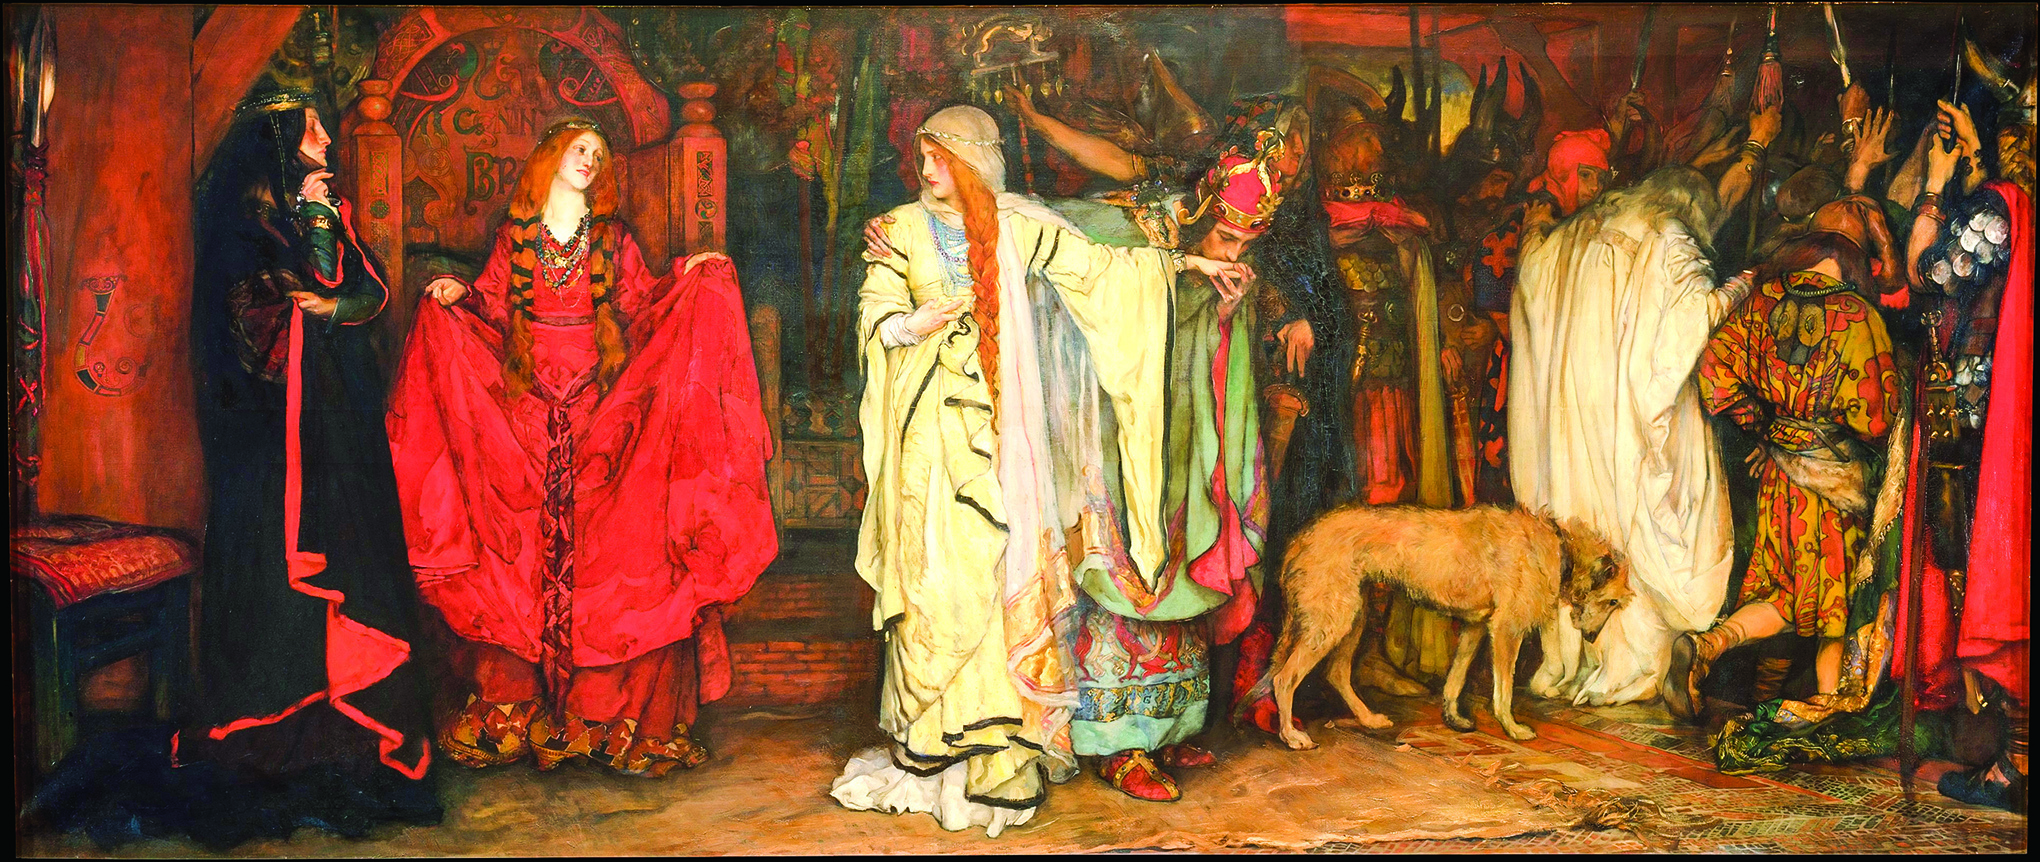 Edwin Austin Abbey於1898年 繪製的《 李爾王:蔻蒂莉亞的告別》(King Lear: Cordelia's Farewell ) (公有領域)